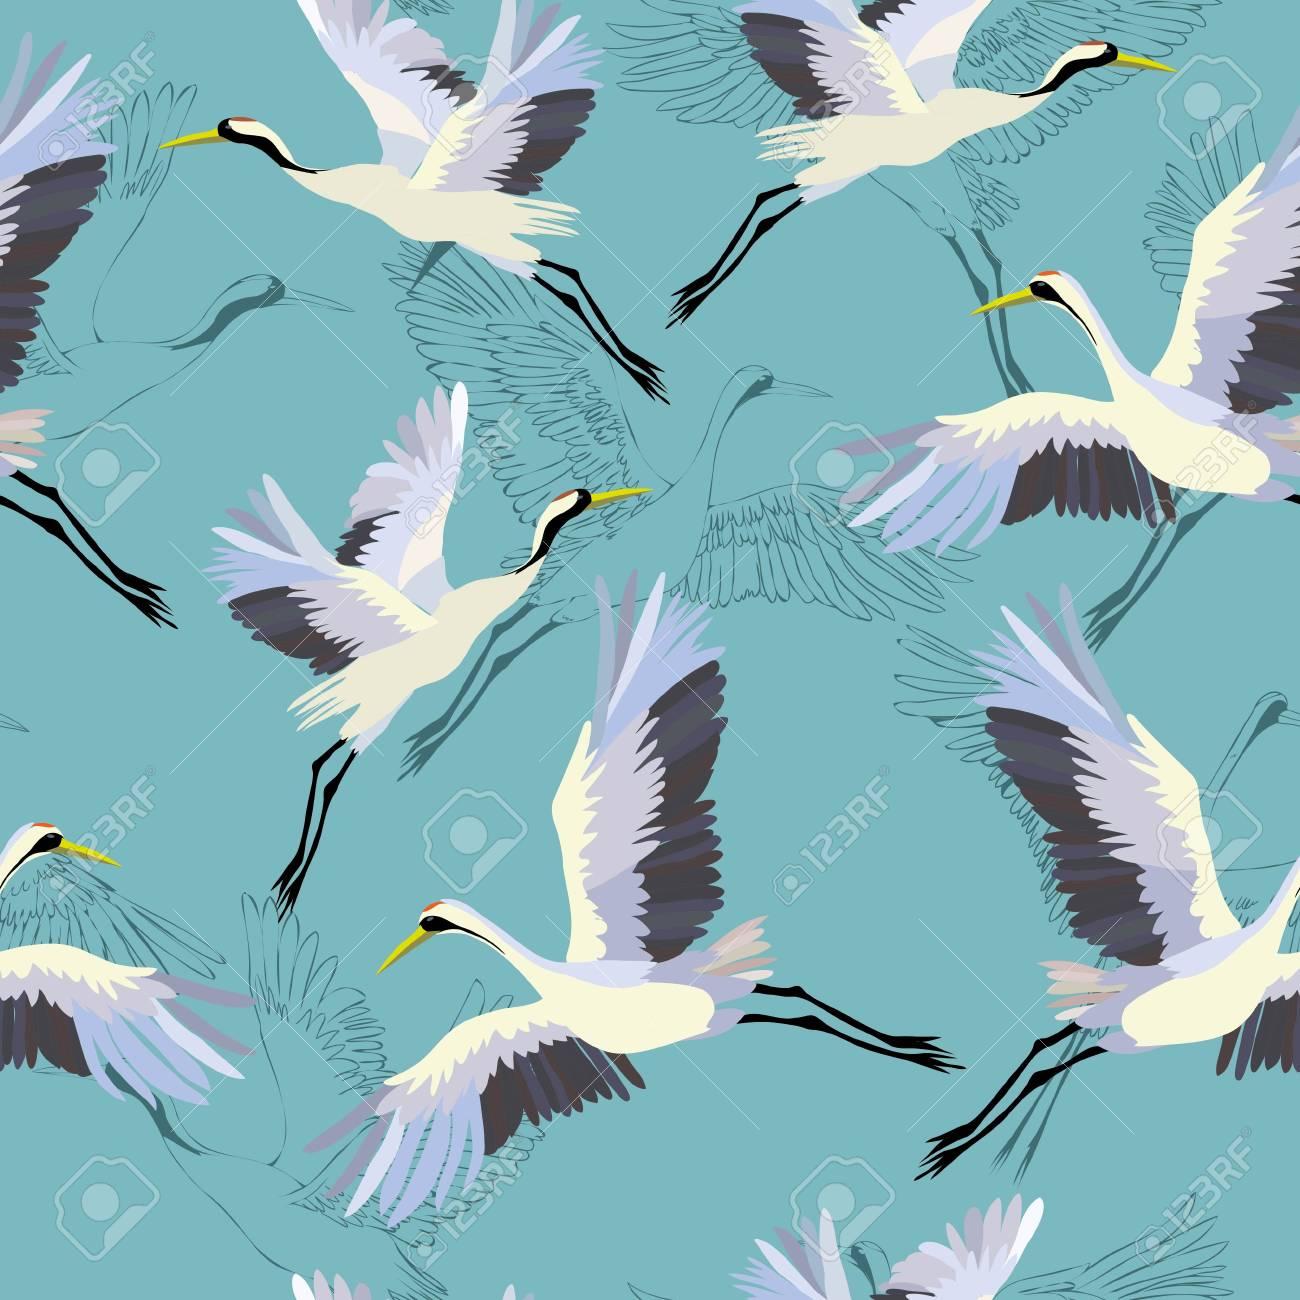 Crane pattern vector illustration - 96785106